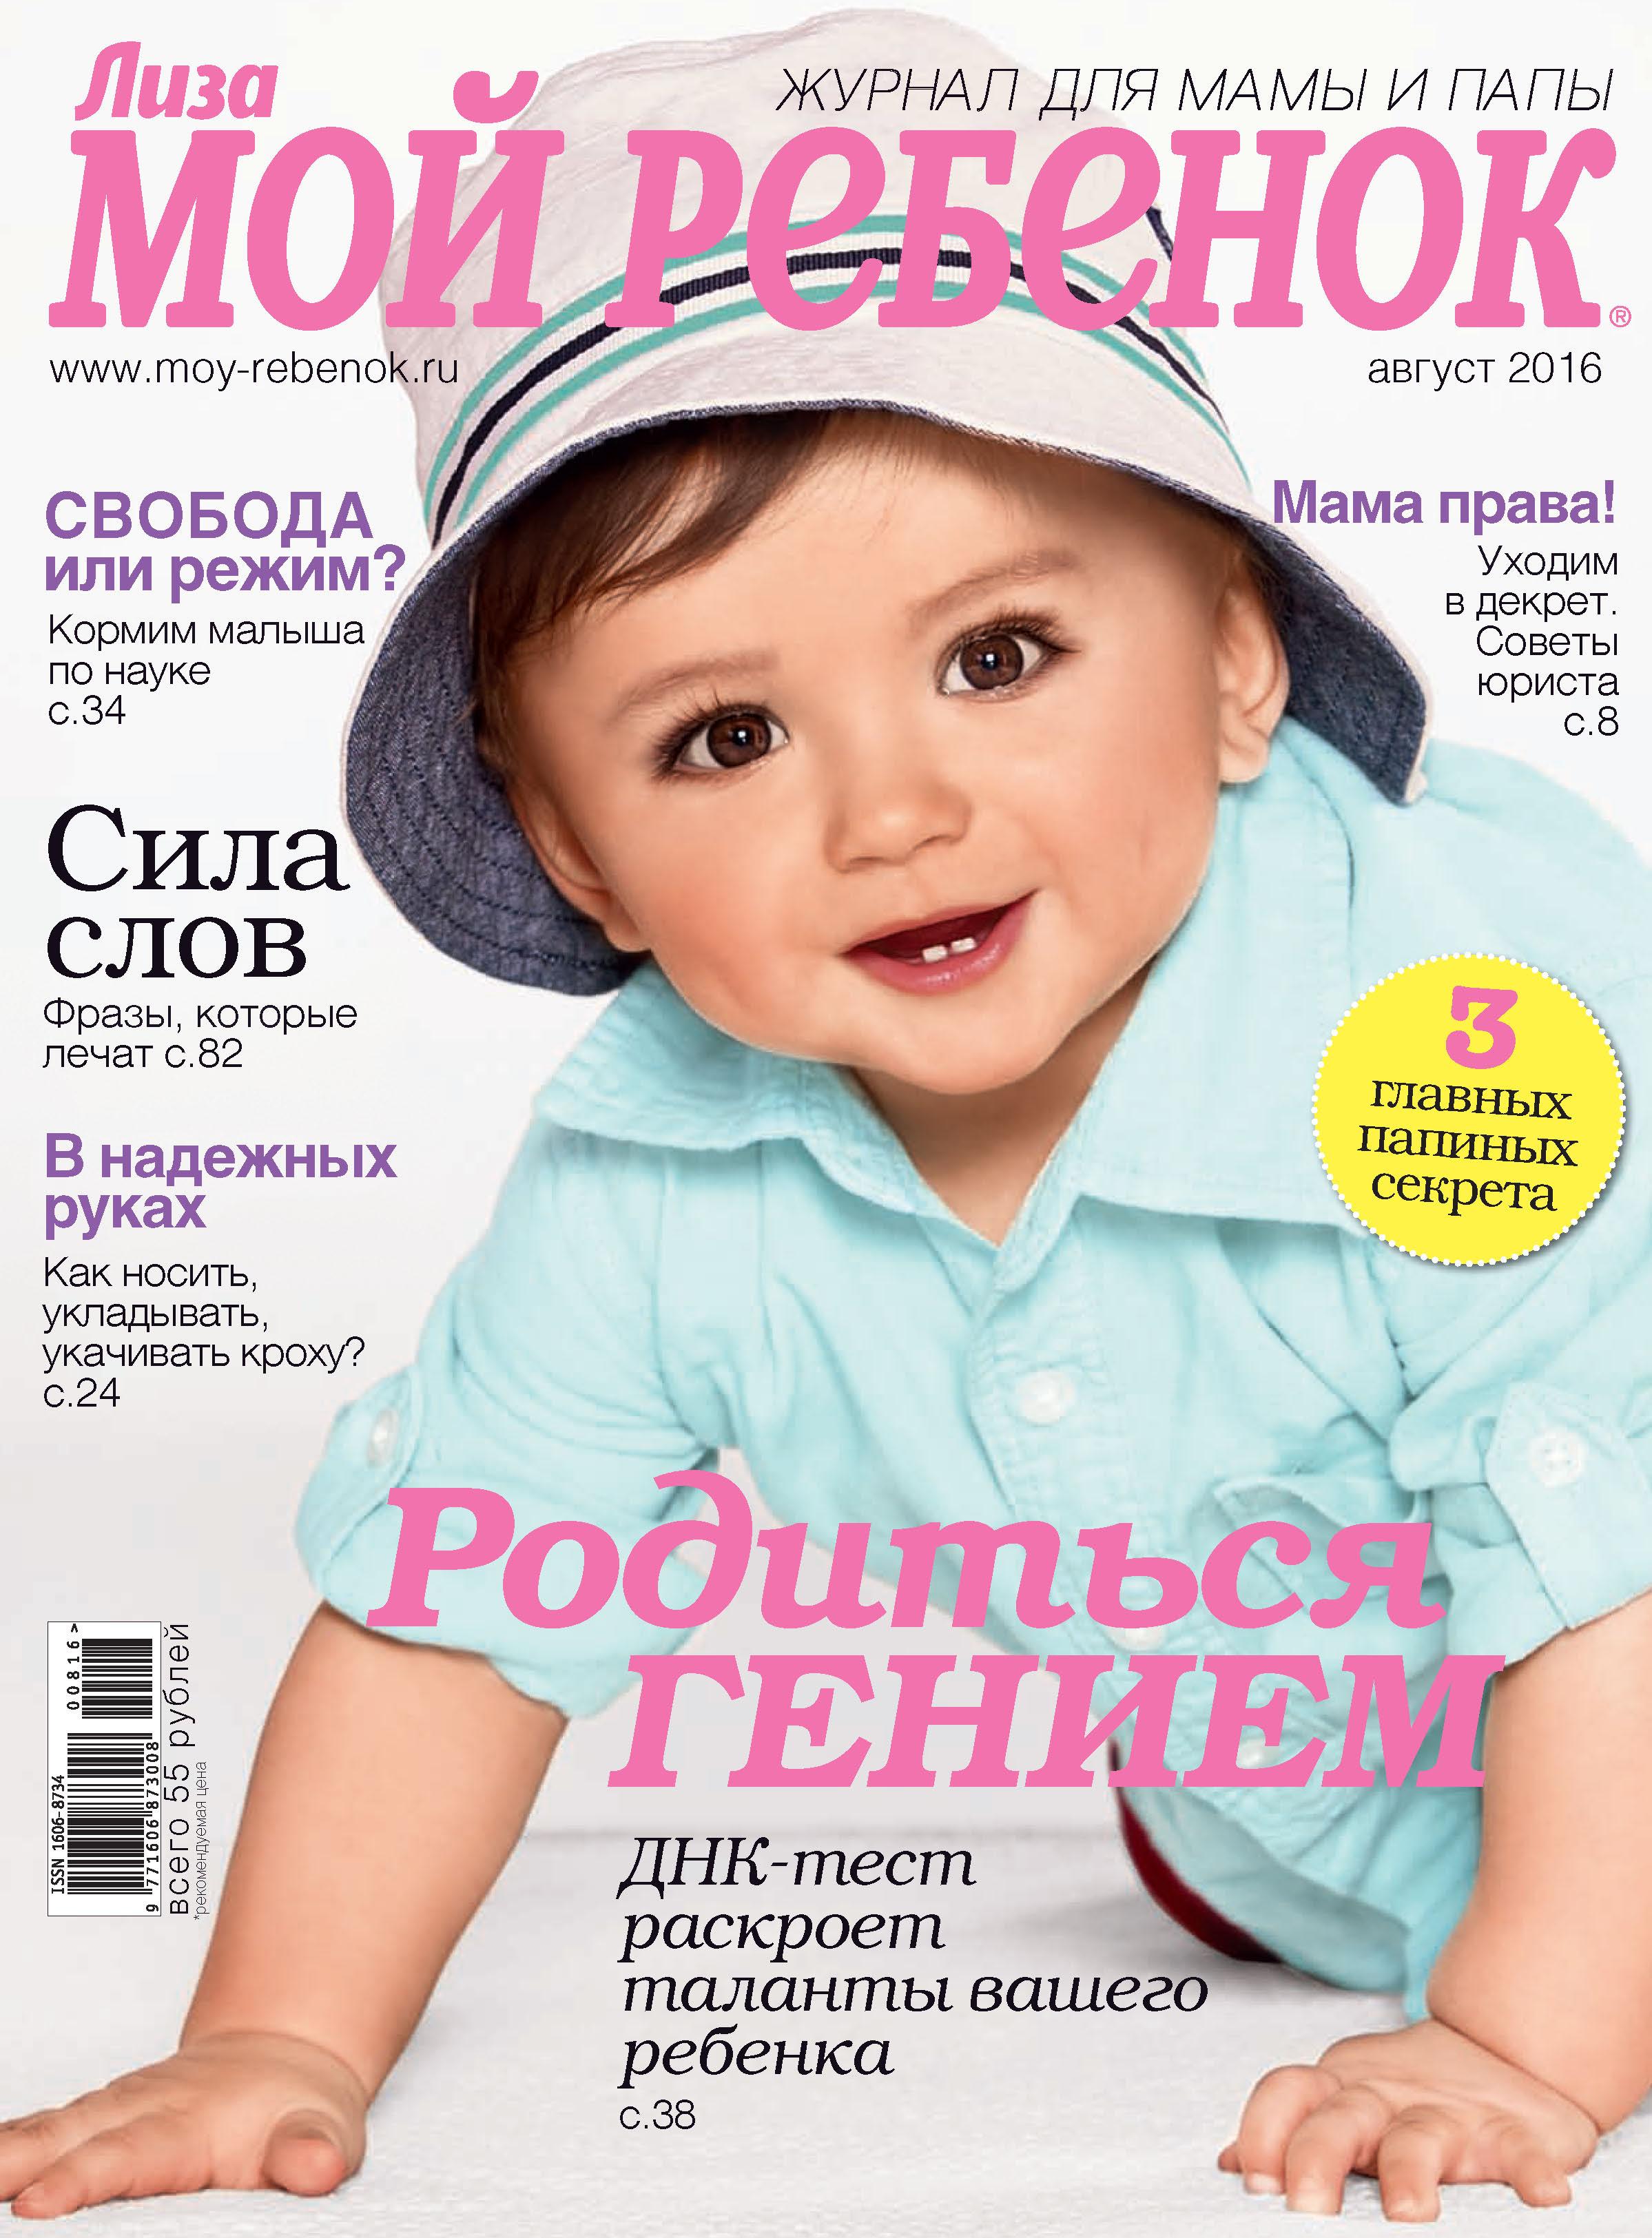 ИД «Бурда» Журнал «Лиза. Мой ребенок» №08/2016 ид бурда журнал лиза мой ребенок 09 2016